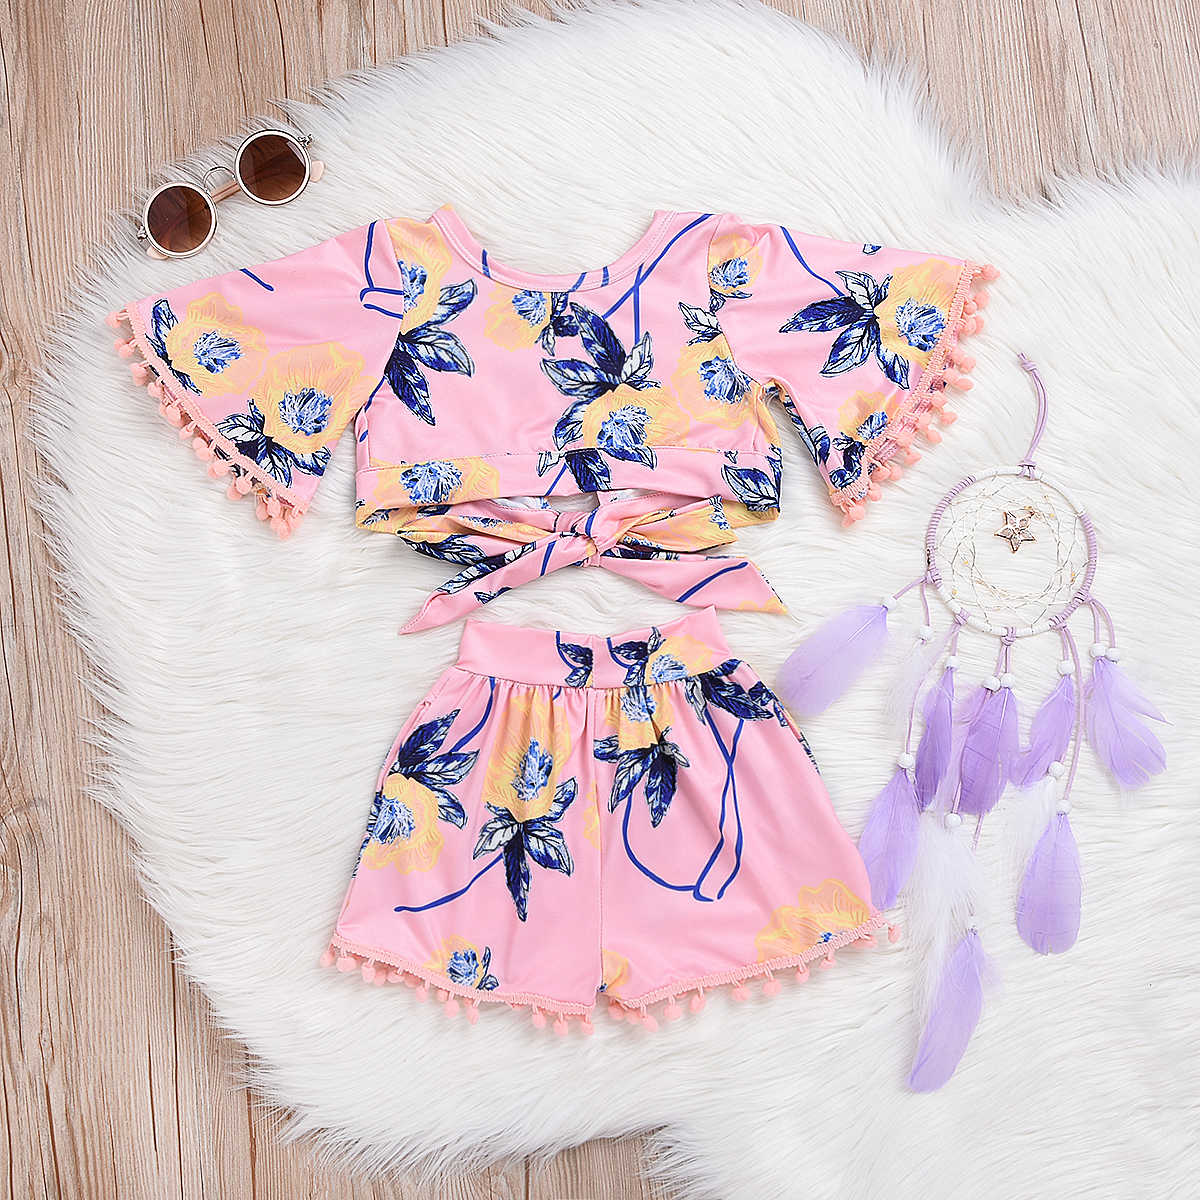 Leuke Kids Baby Meisjes Hawaii Outfits Kleding T-shirt Tops Jurk + Lange Broek 2 STKS Set